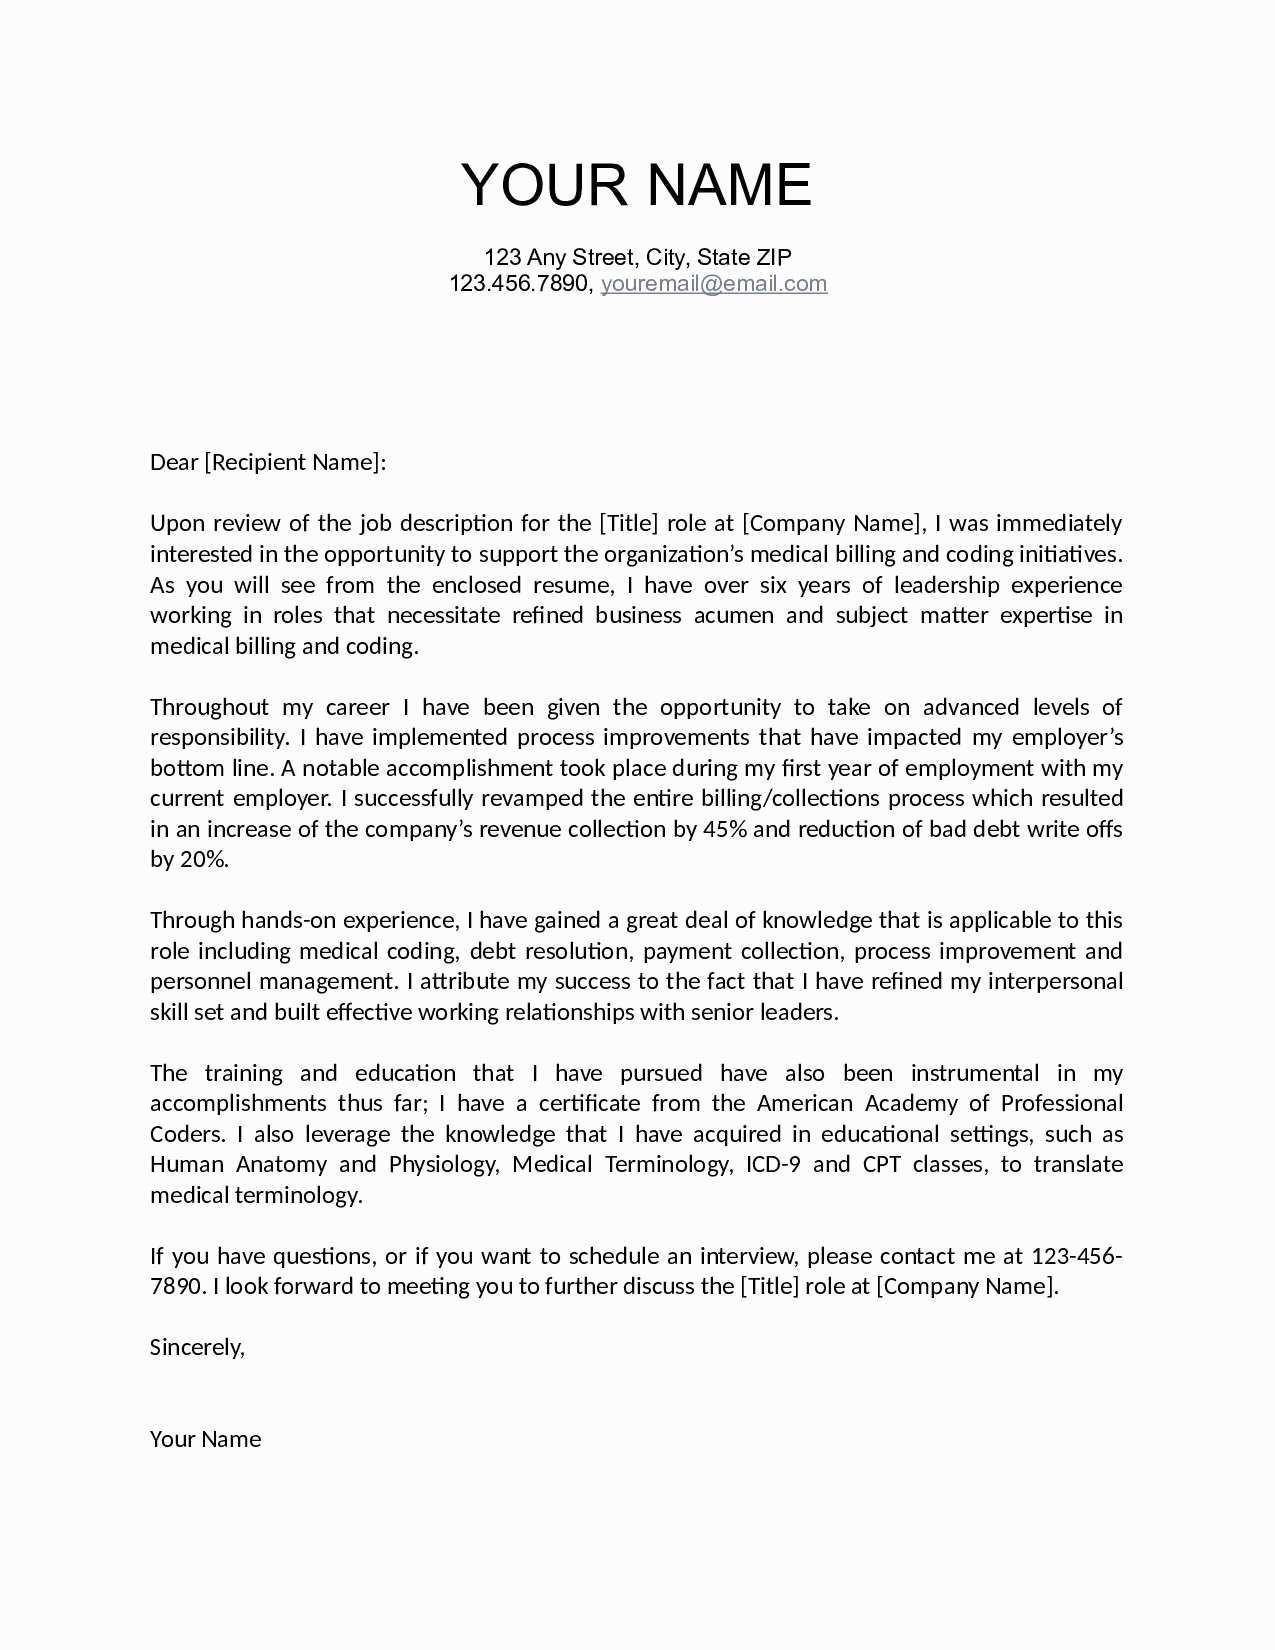 Basic Cover Letter Template - Simple Resume Letter format